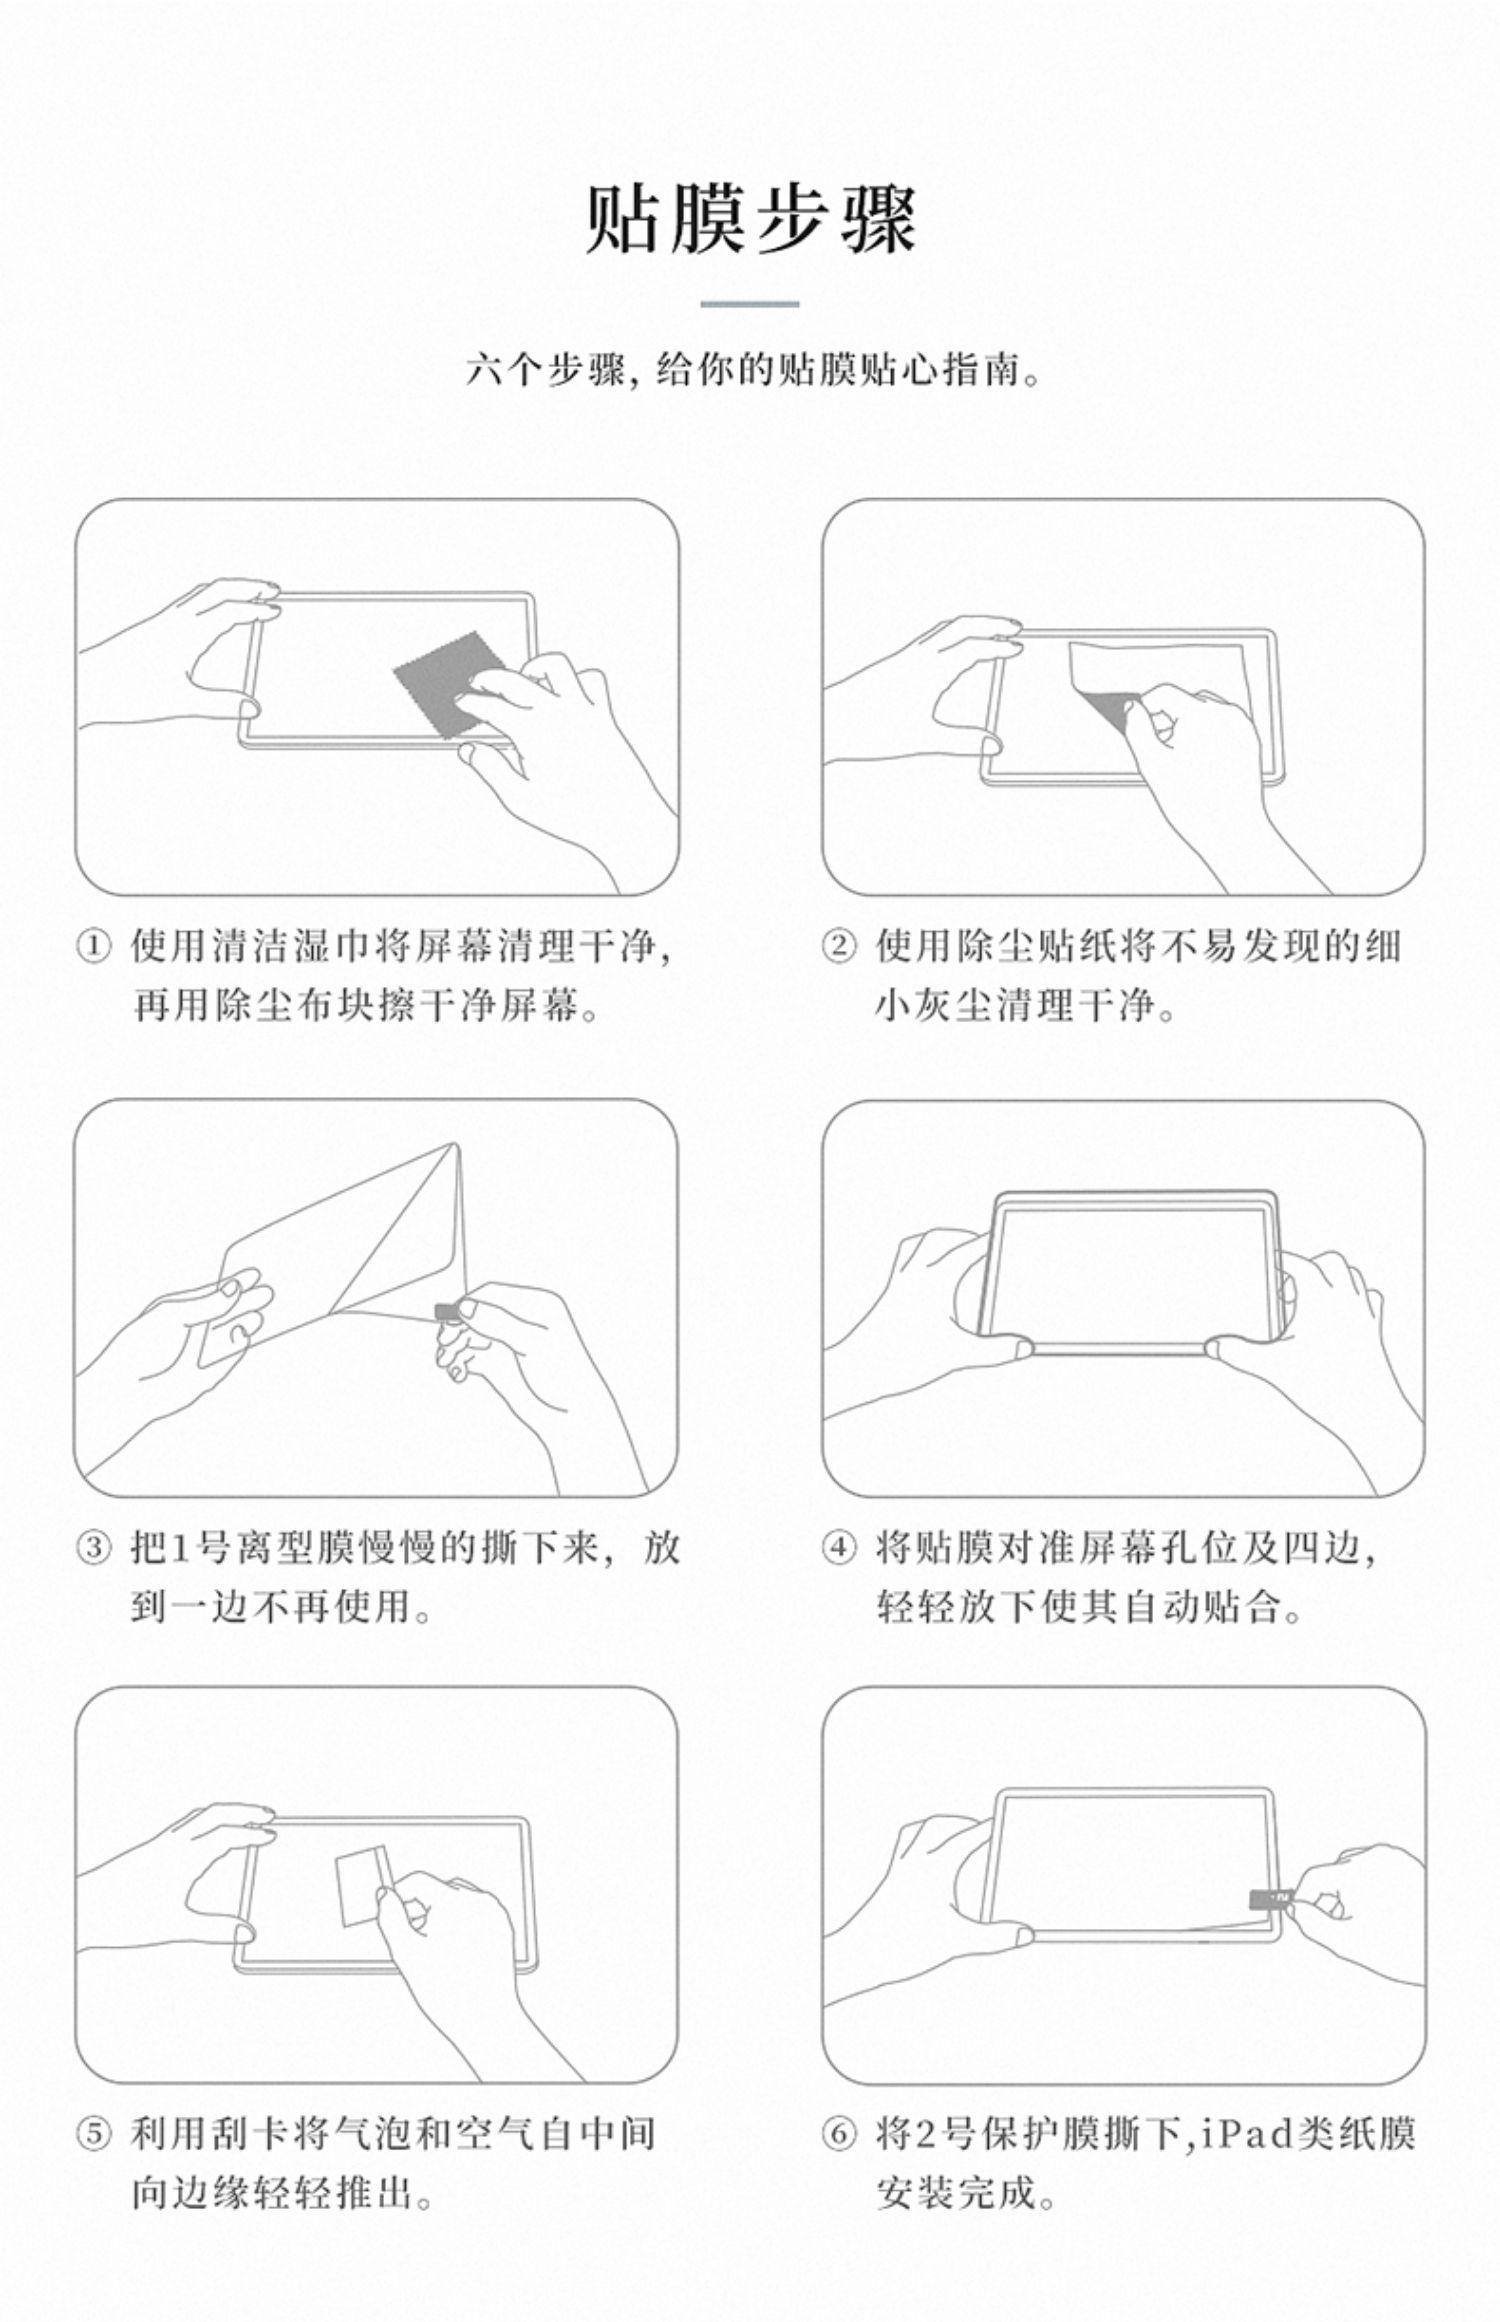 Benks ipad类纸膜2018新款pro11磨砂10.2手写Air3绘画10.5寸9.7写字12.9平板2019mini5书写日本保护钢化贴膜4商品详情图